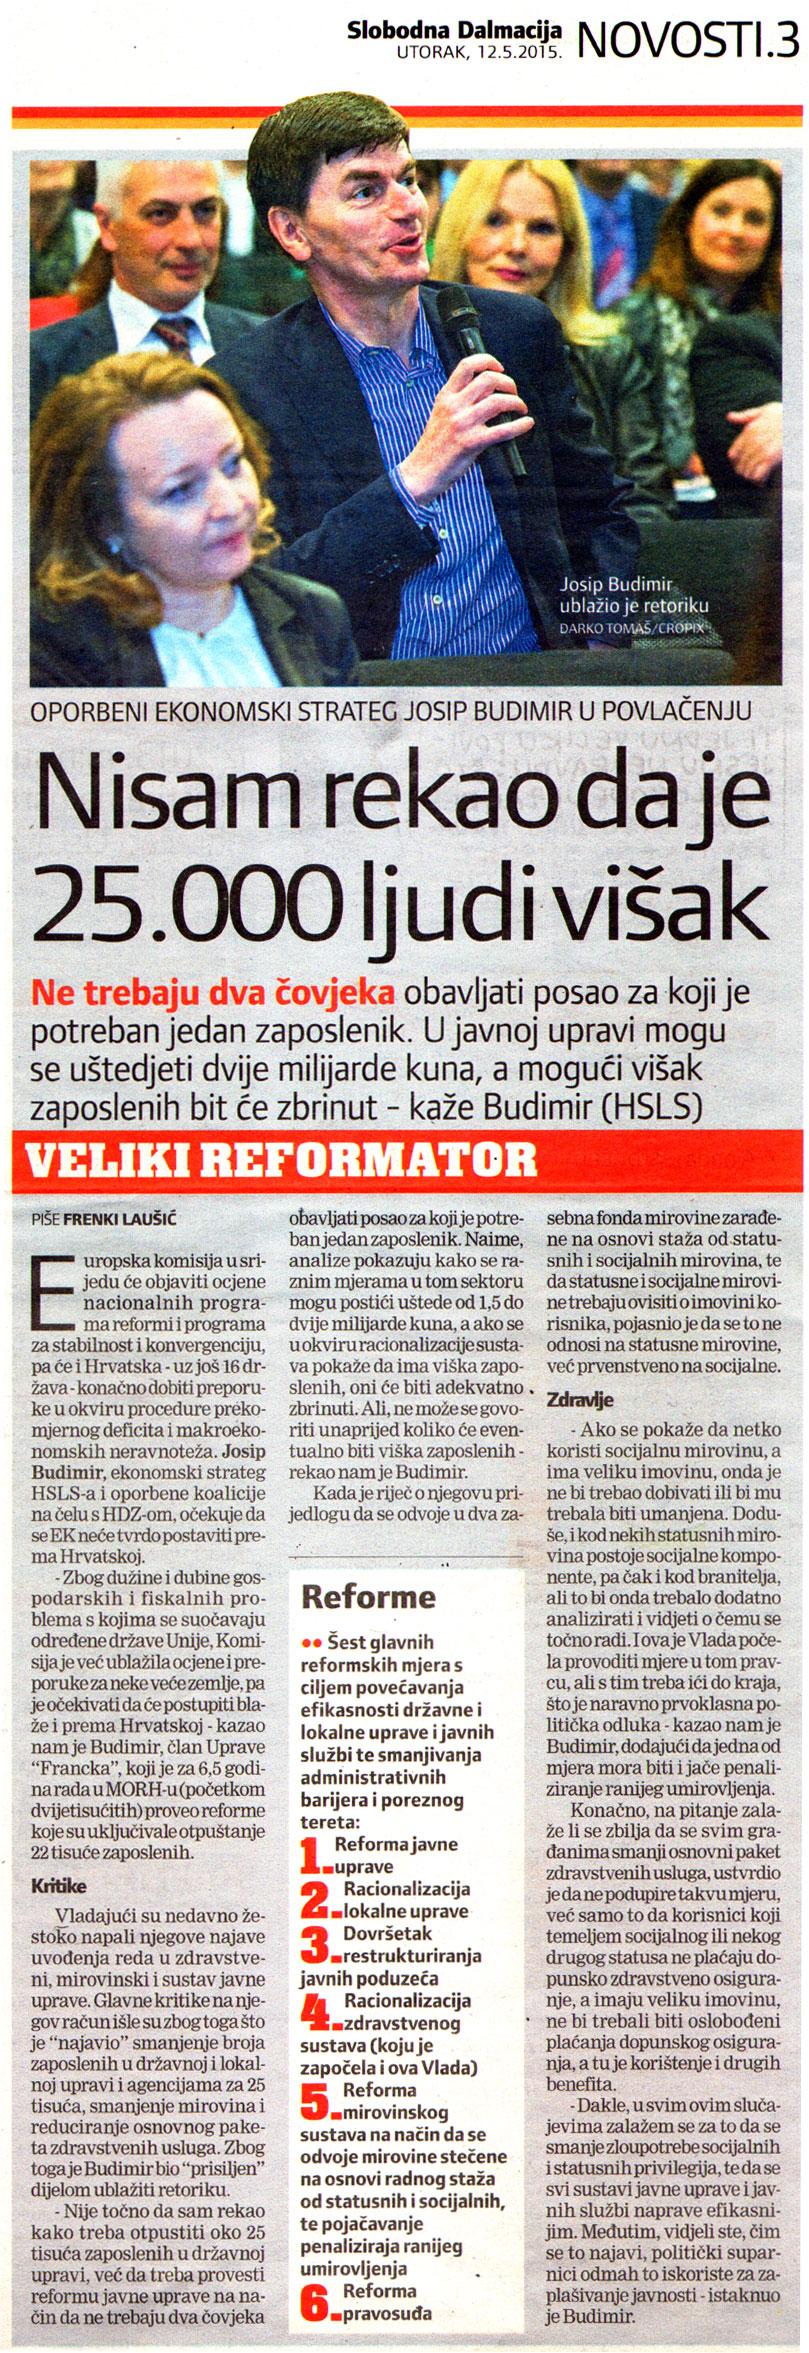 budimir_sd120515